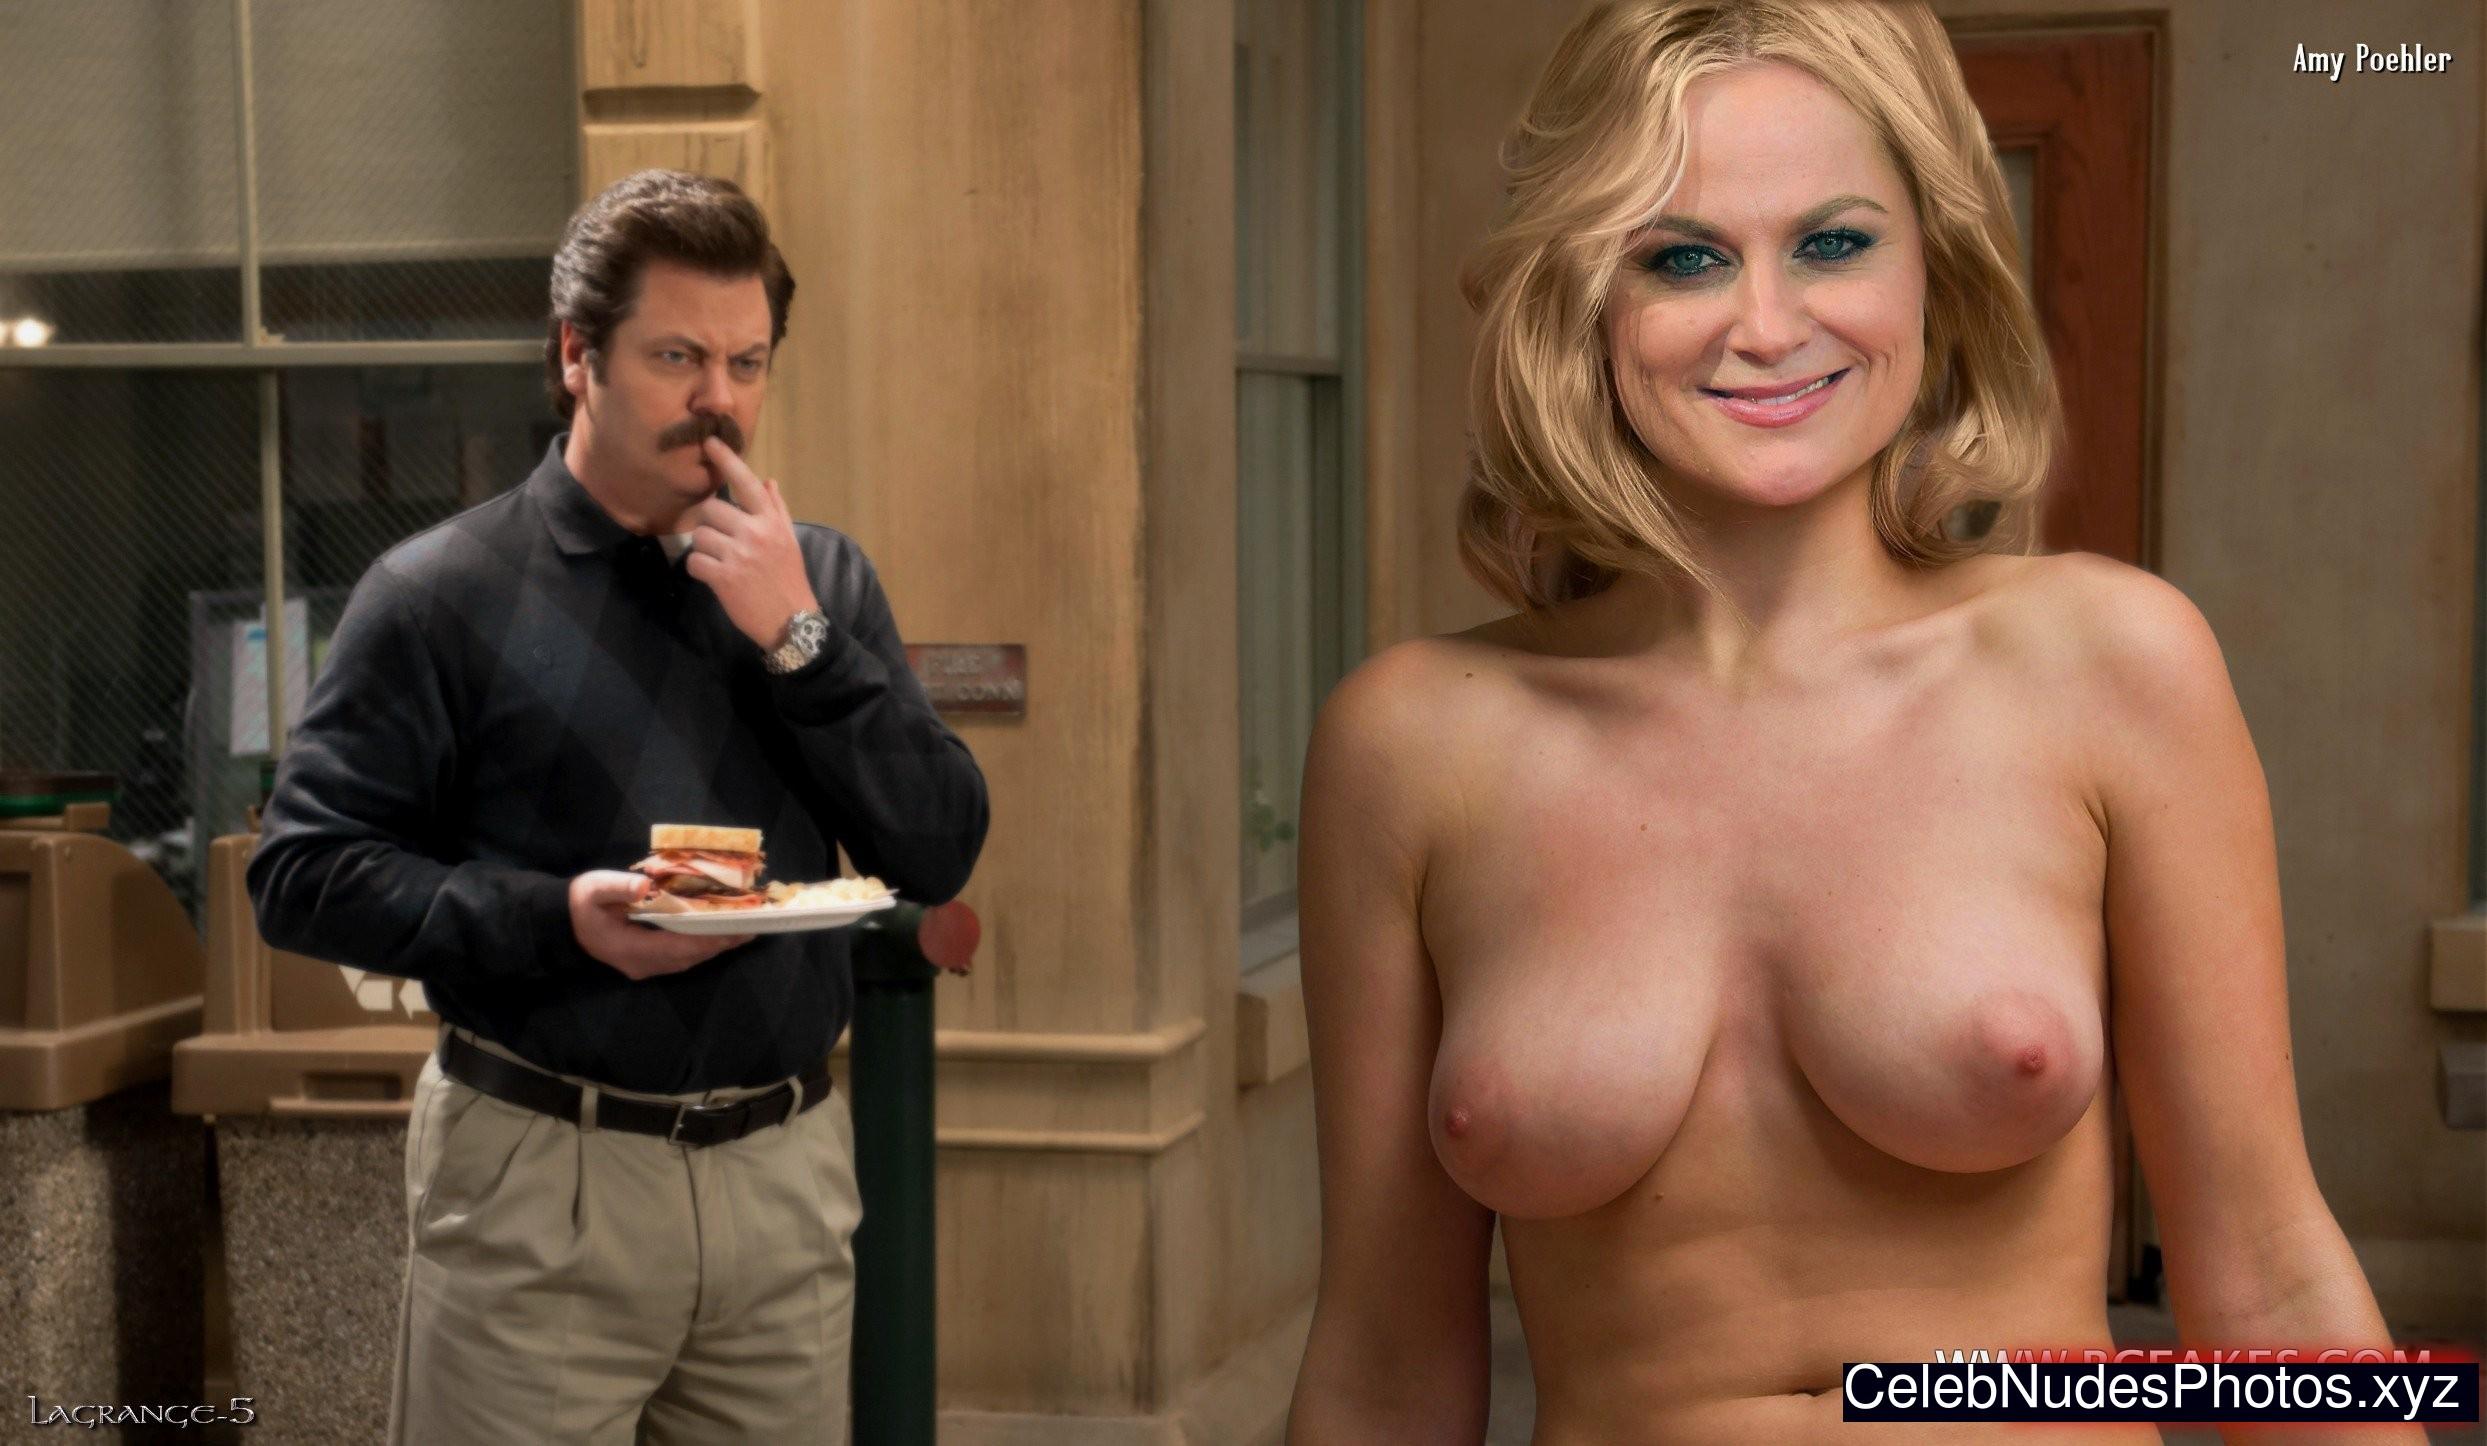 Amy Poehler Desnuda amy pohler nude.